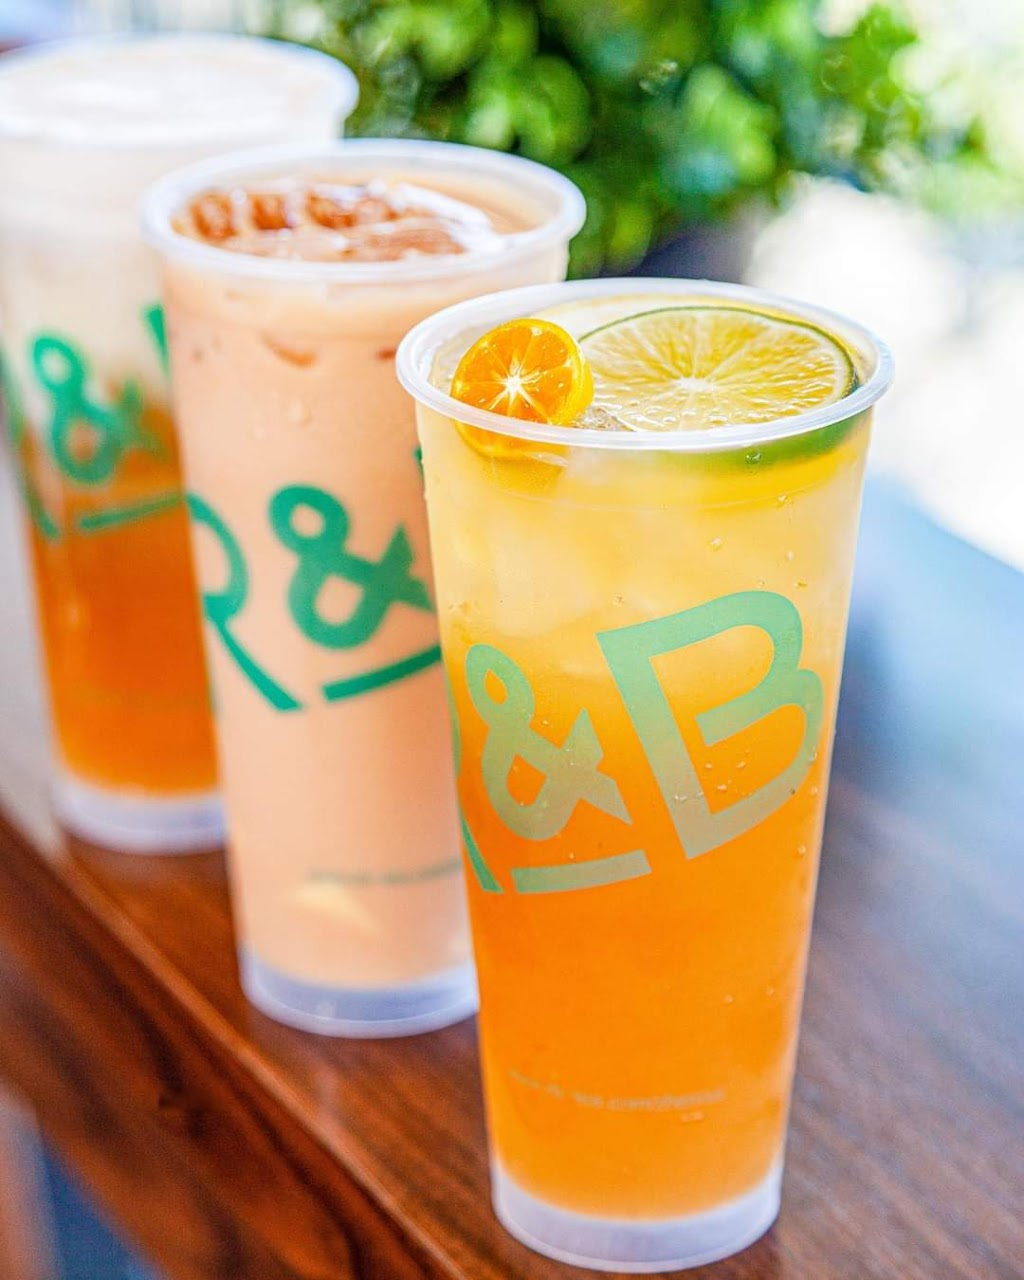 R&B Tea USA - Gardena - cafe    Photo 3 of 10   Address: 1847 W Redondo Beach Blvd, Gardena, CA 90247, USA   Phone: (310) 817-4779